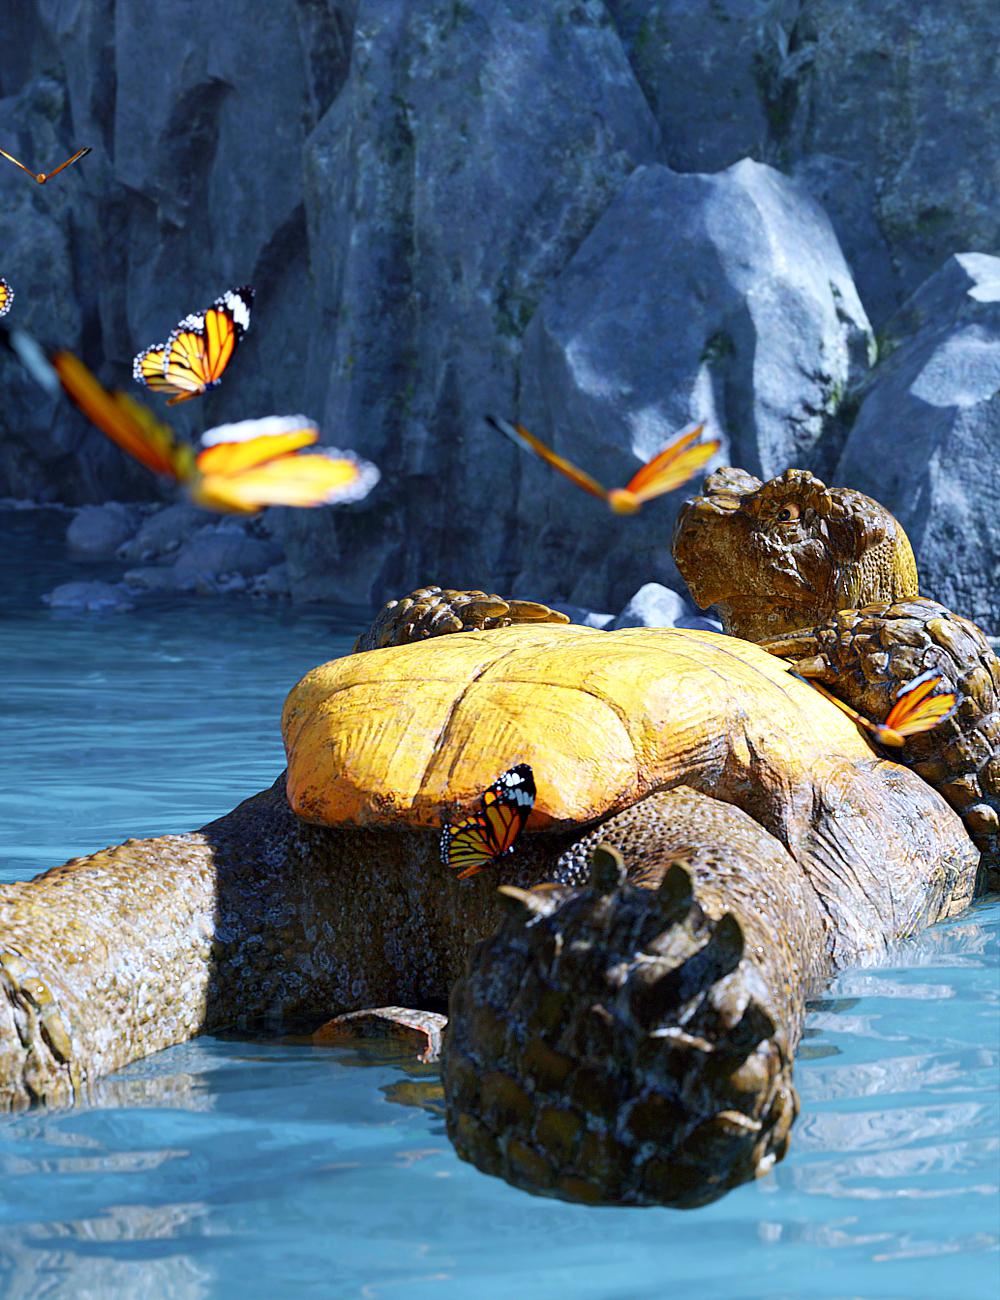 Storybook Turtle HD for Genesis 8.1 Males by: JoeQuick, 3D Models by Daz 3D